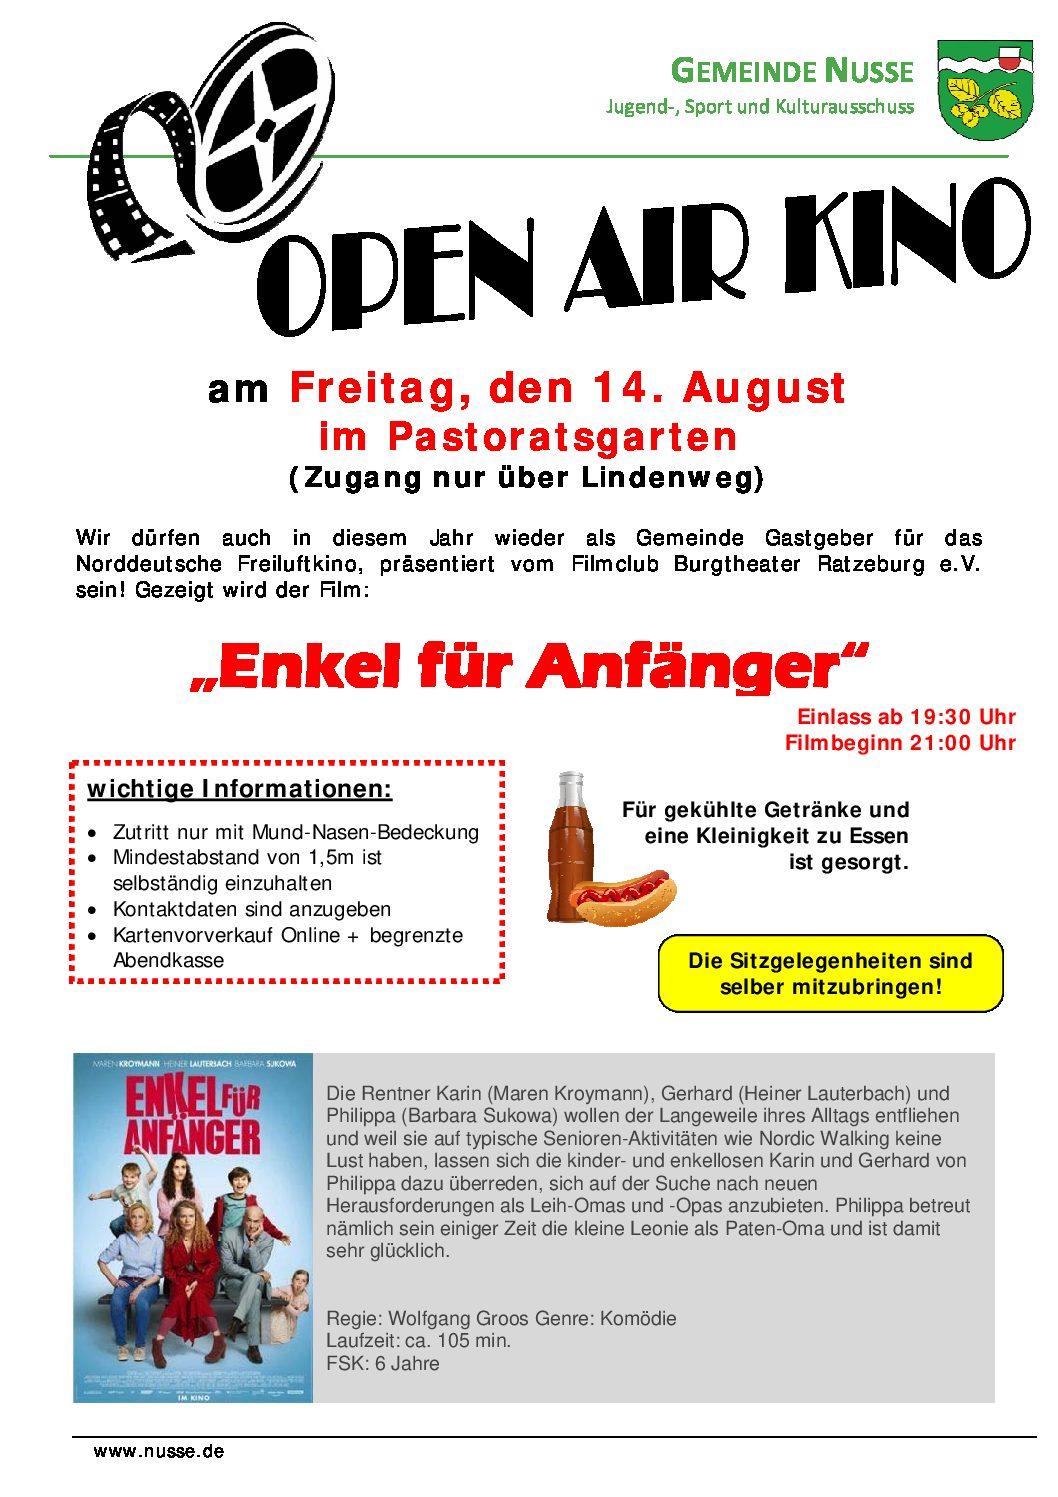 Open Air Kino Am Kommenden Freitag In Nusse